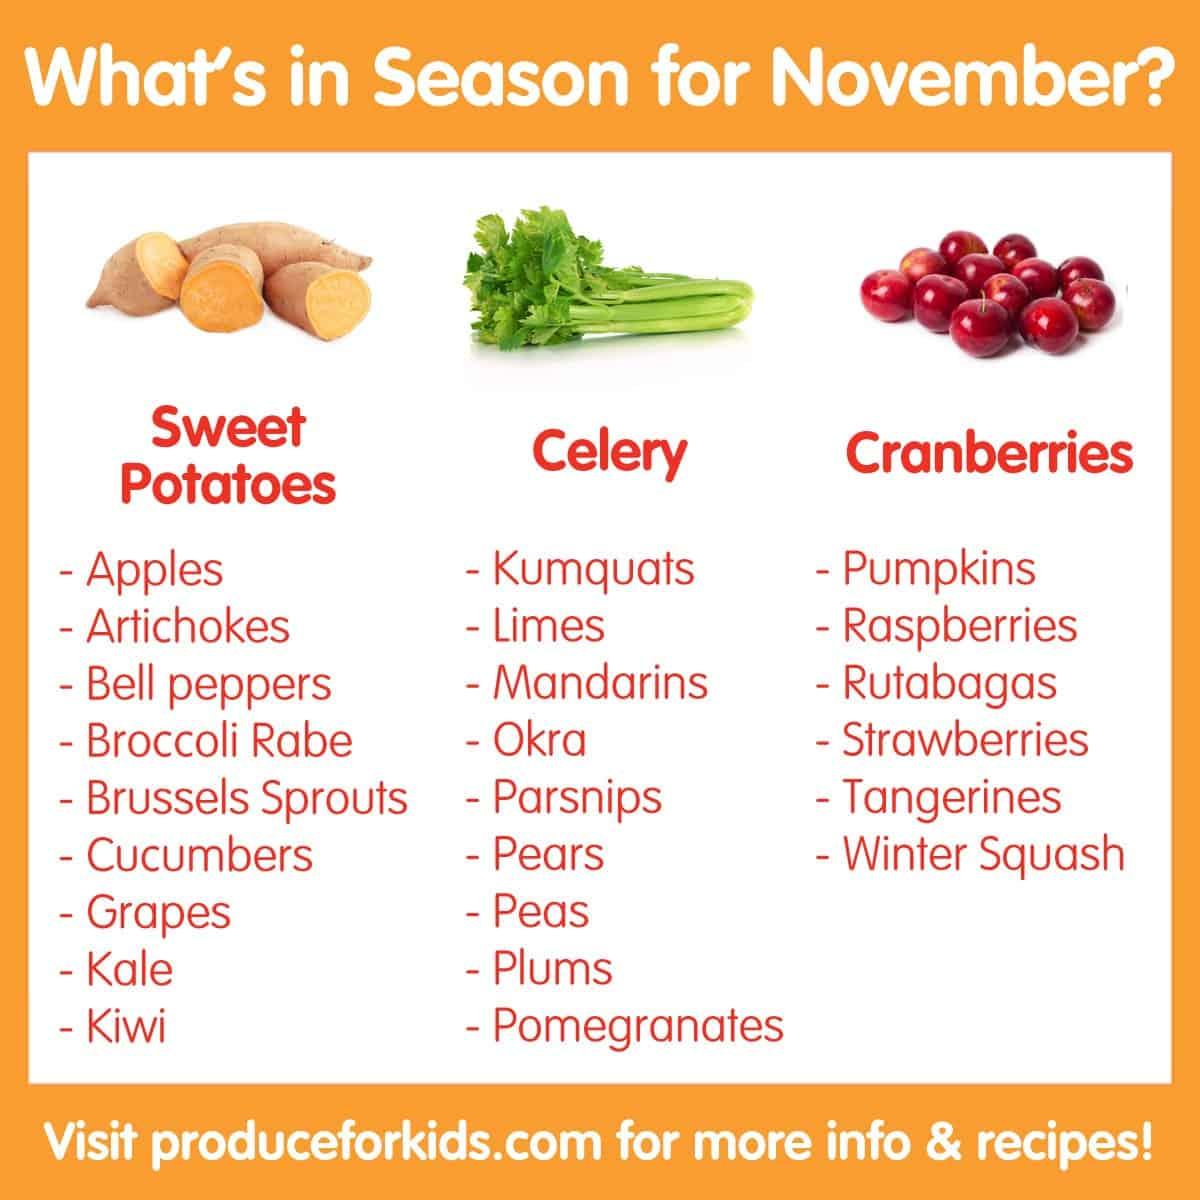 What's in Season for November?